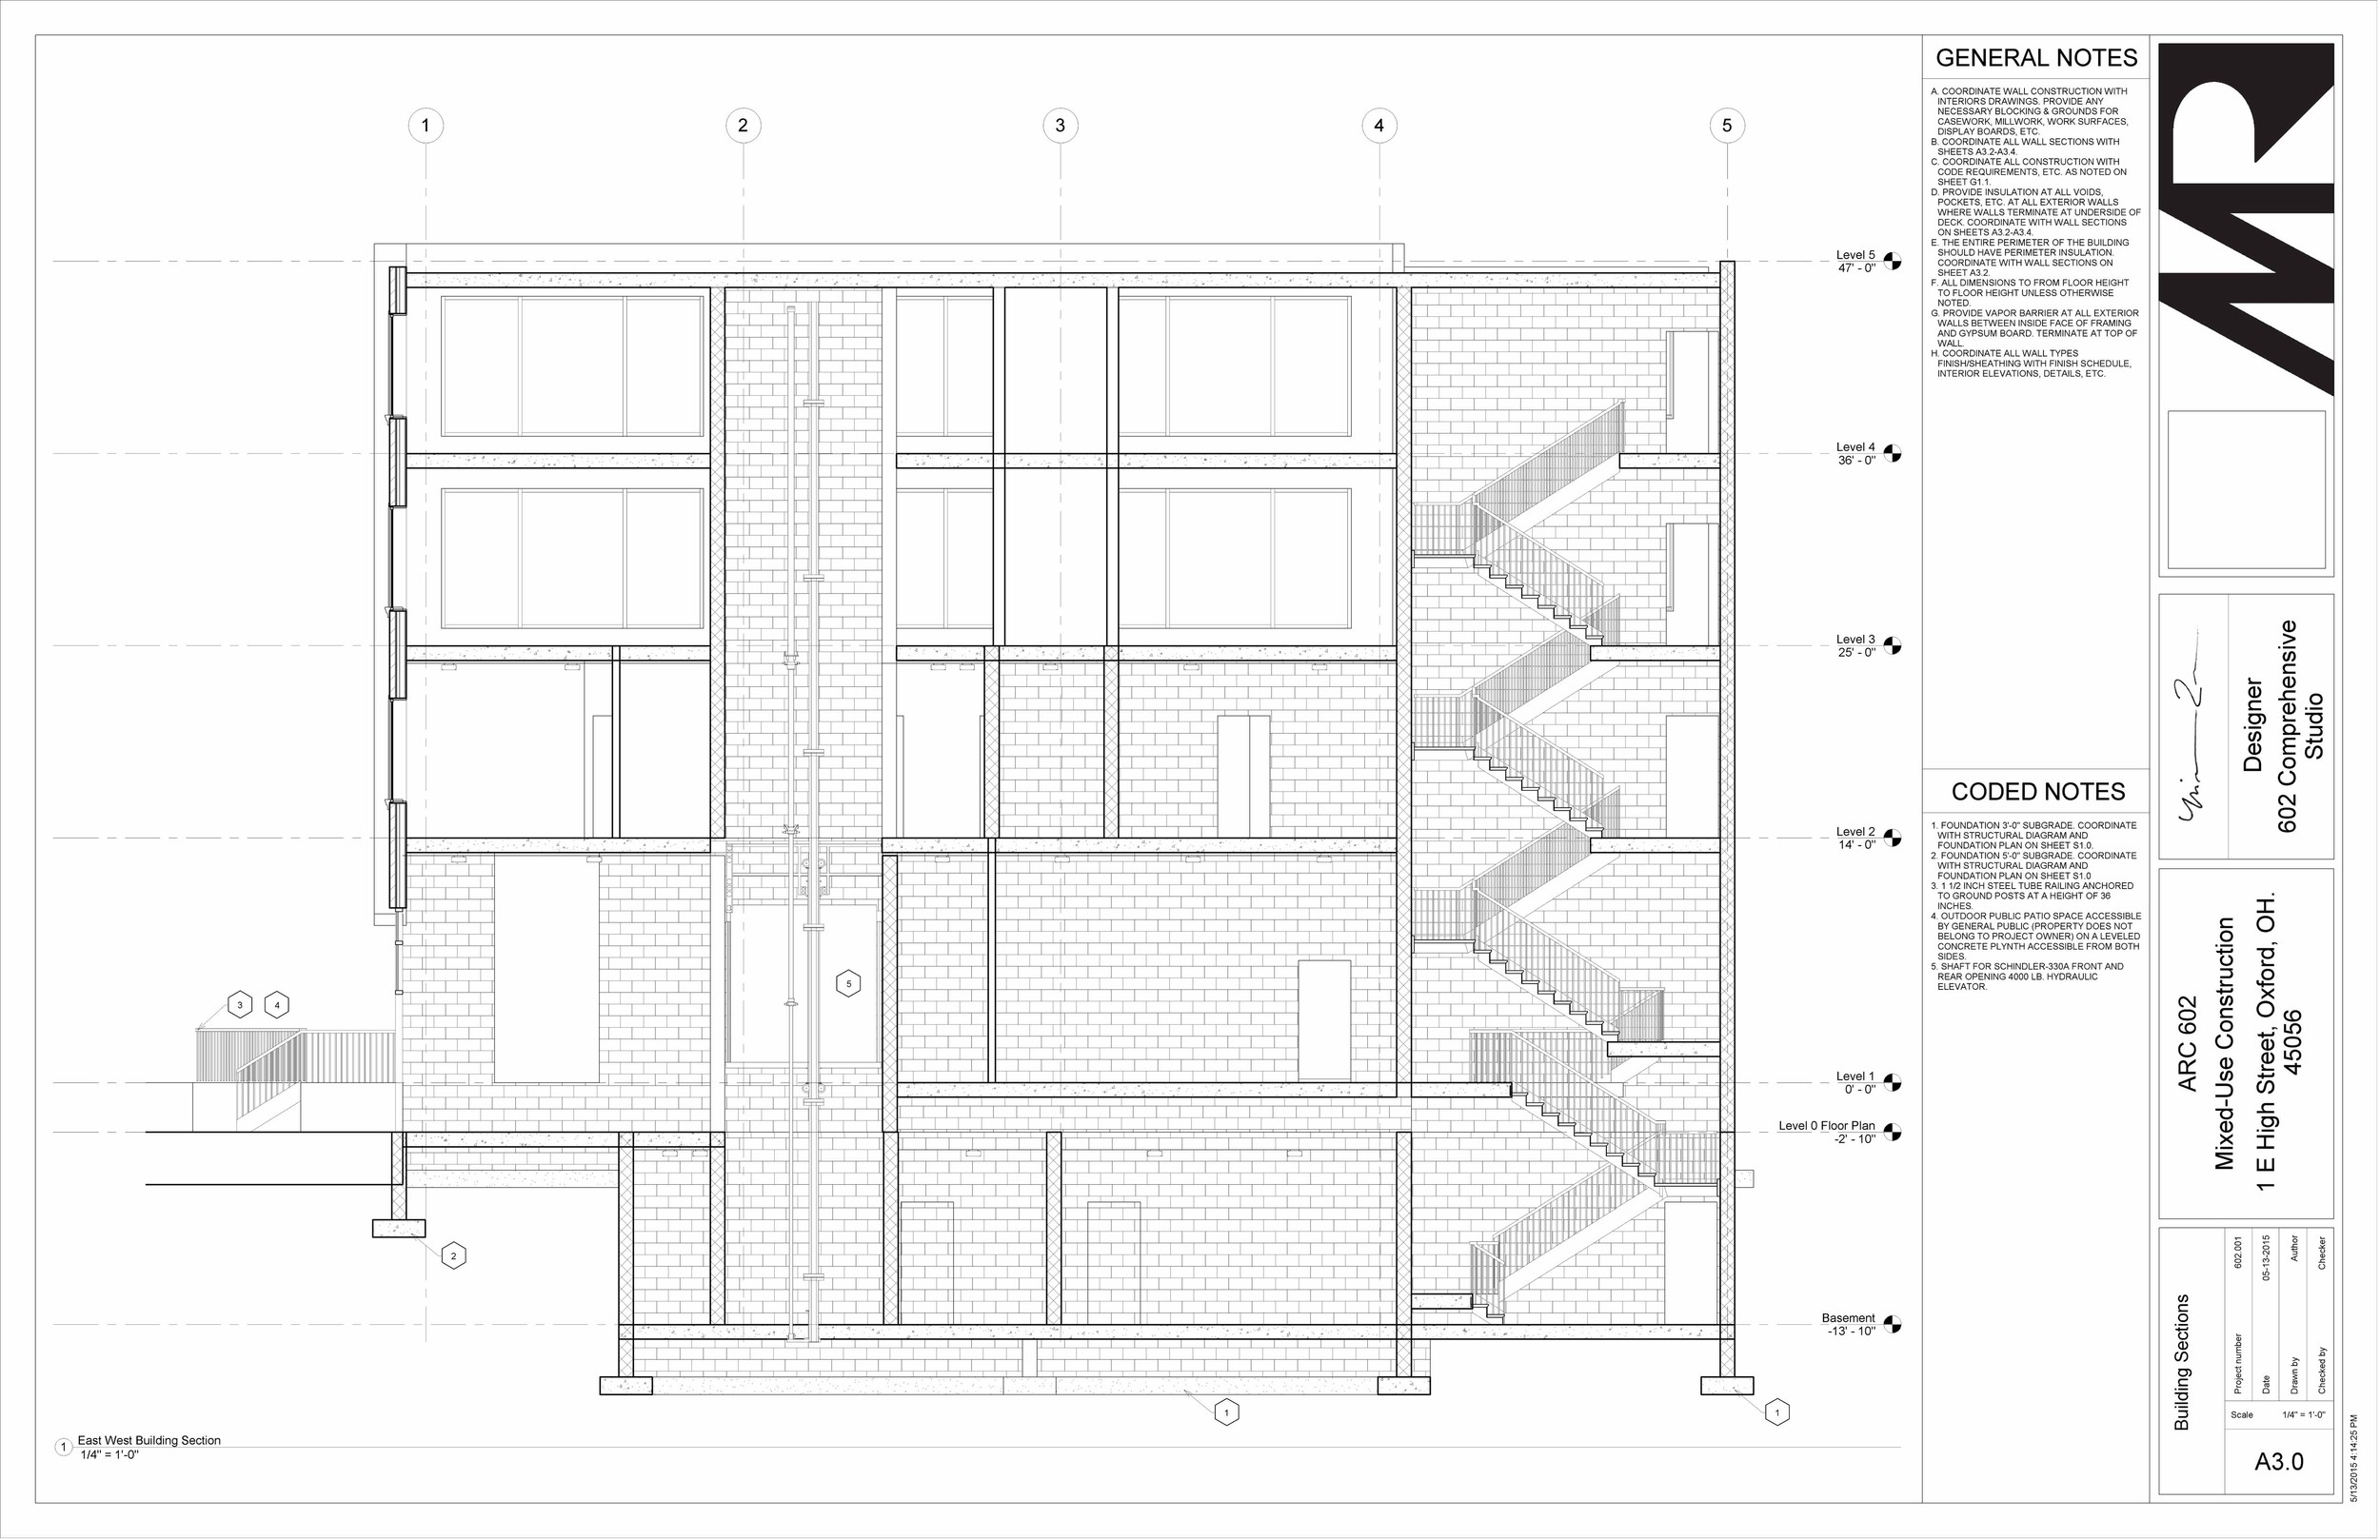 602 Studio - Sheet - A3-0 - Building Sections copy.jpg